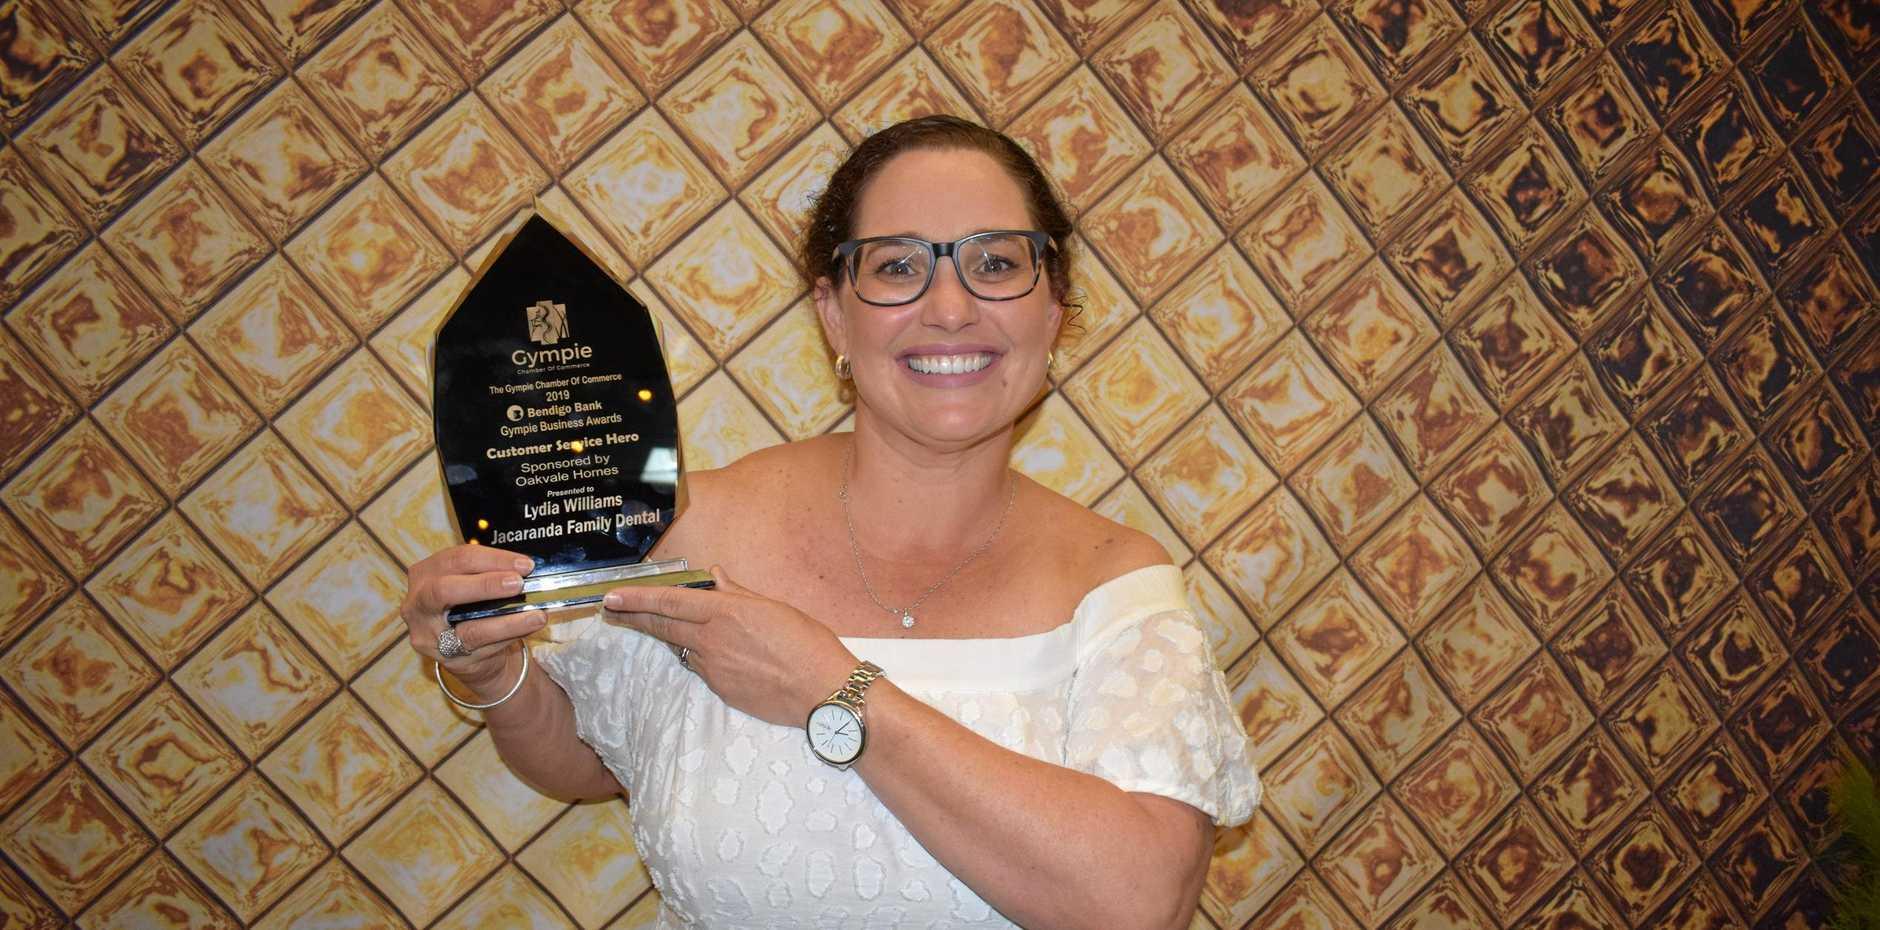 Lydia Williams from Jacaranda Family Dental was awarded Customer Service Hero at the 2019 Gympie Business Awards.